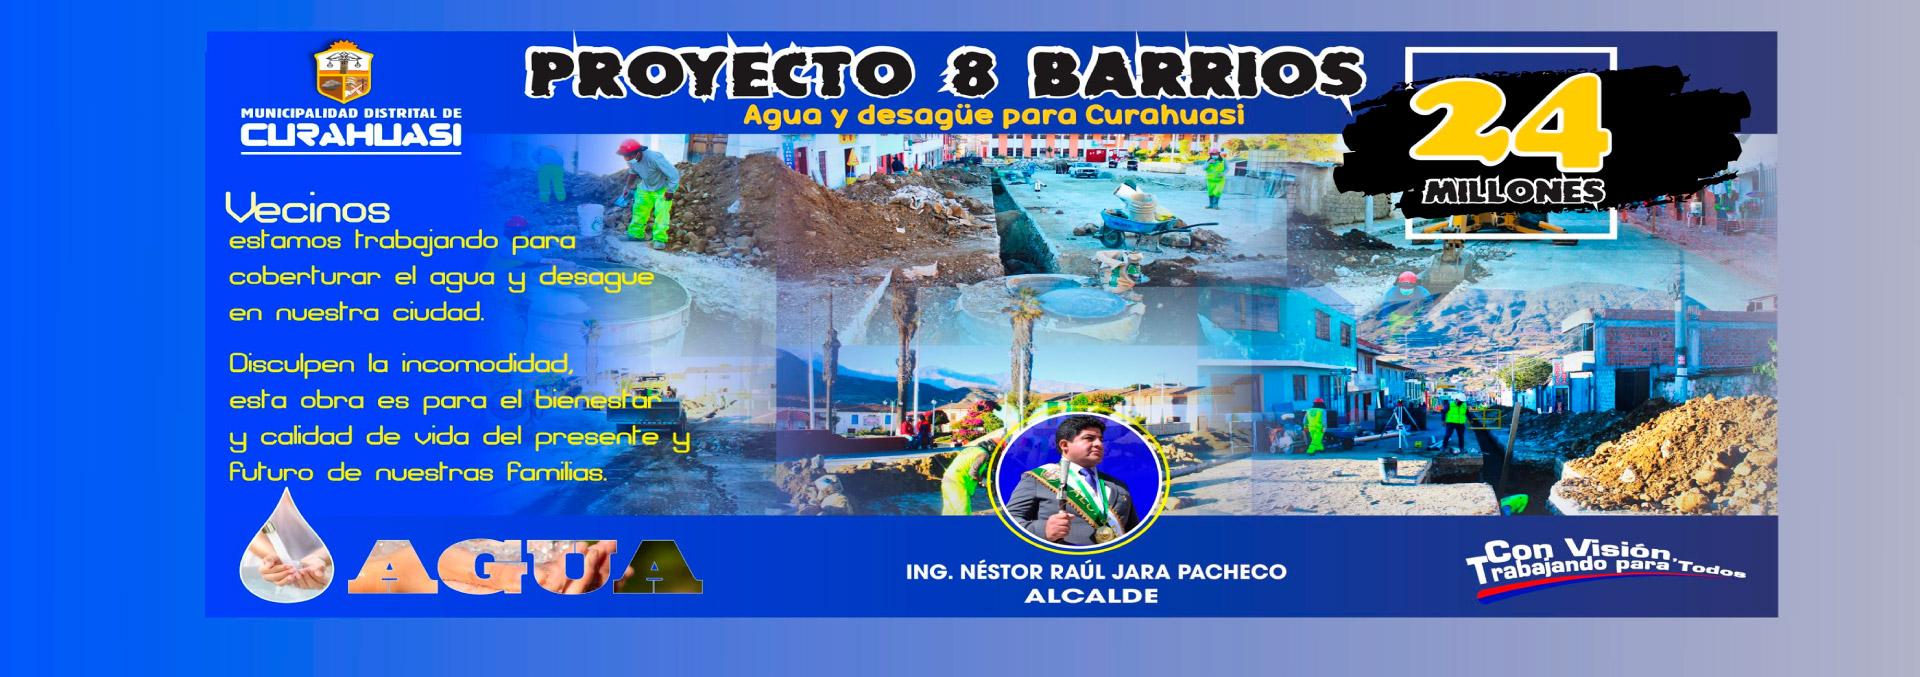 PROYECTO_8_BARRIOS